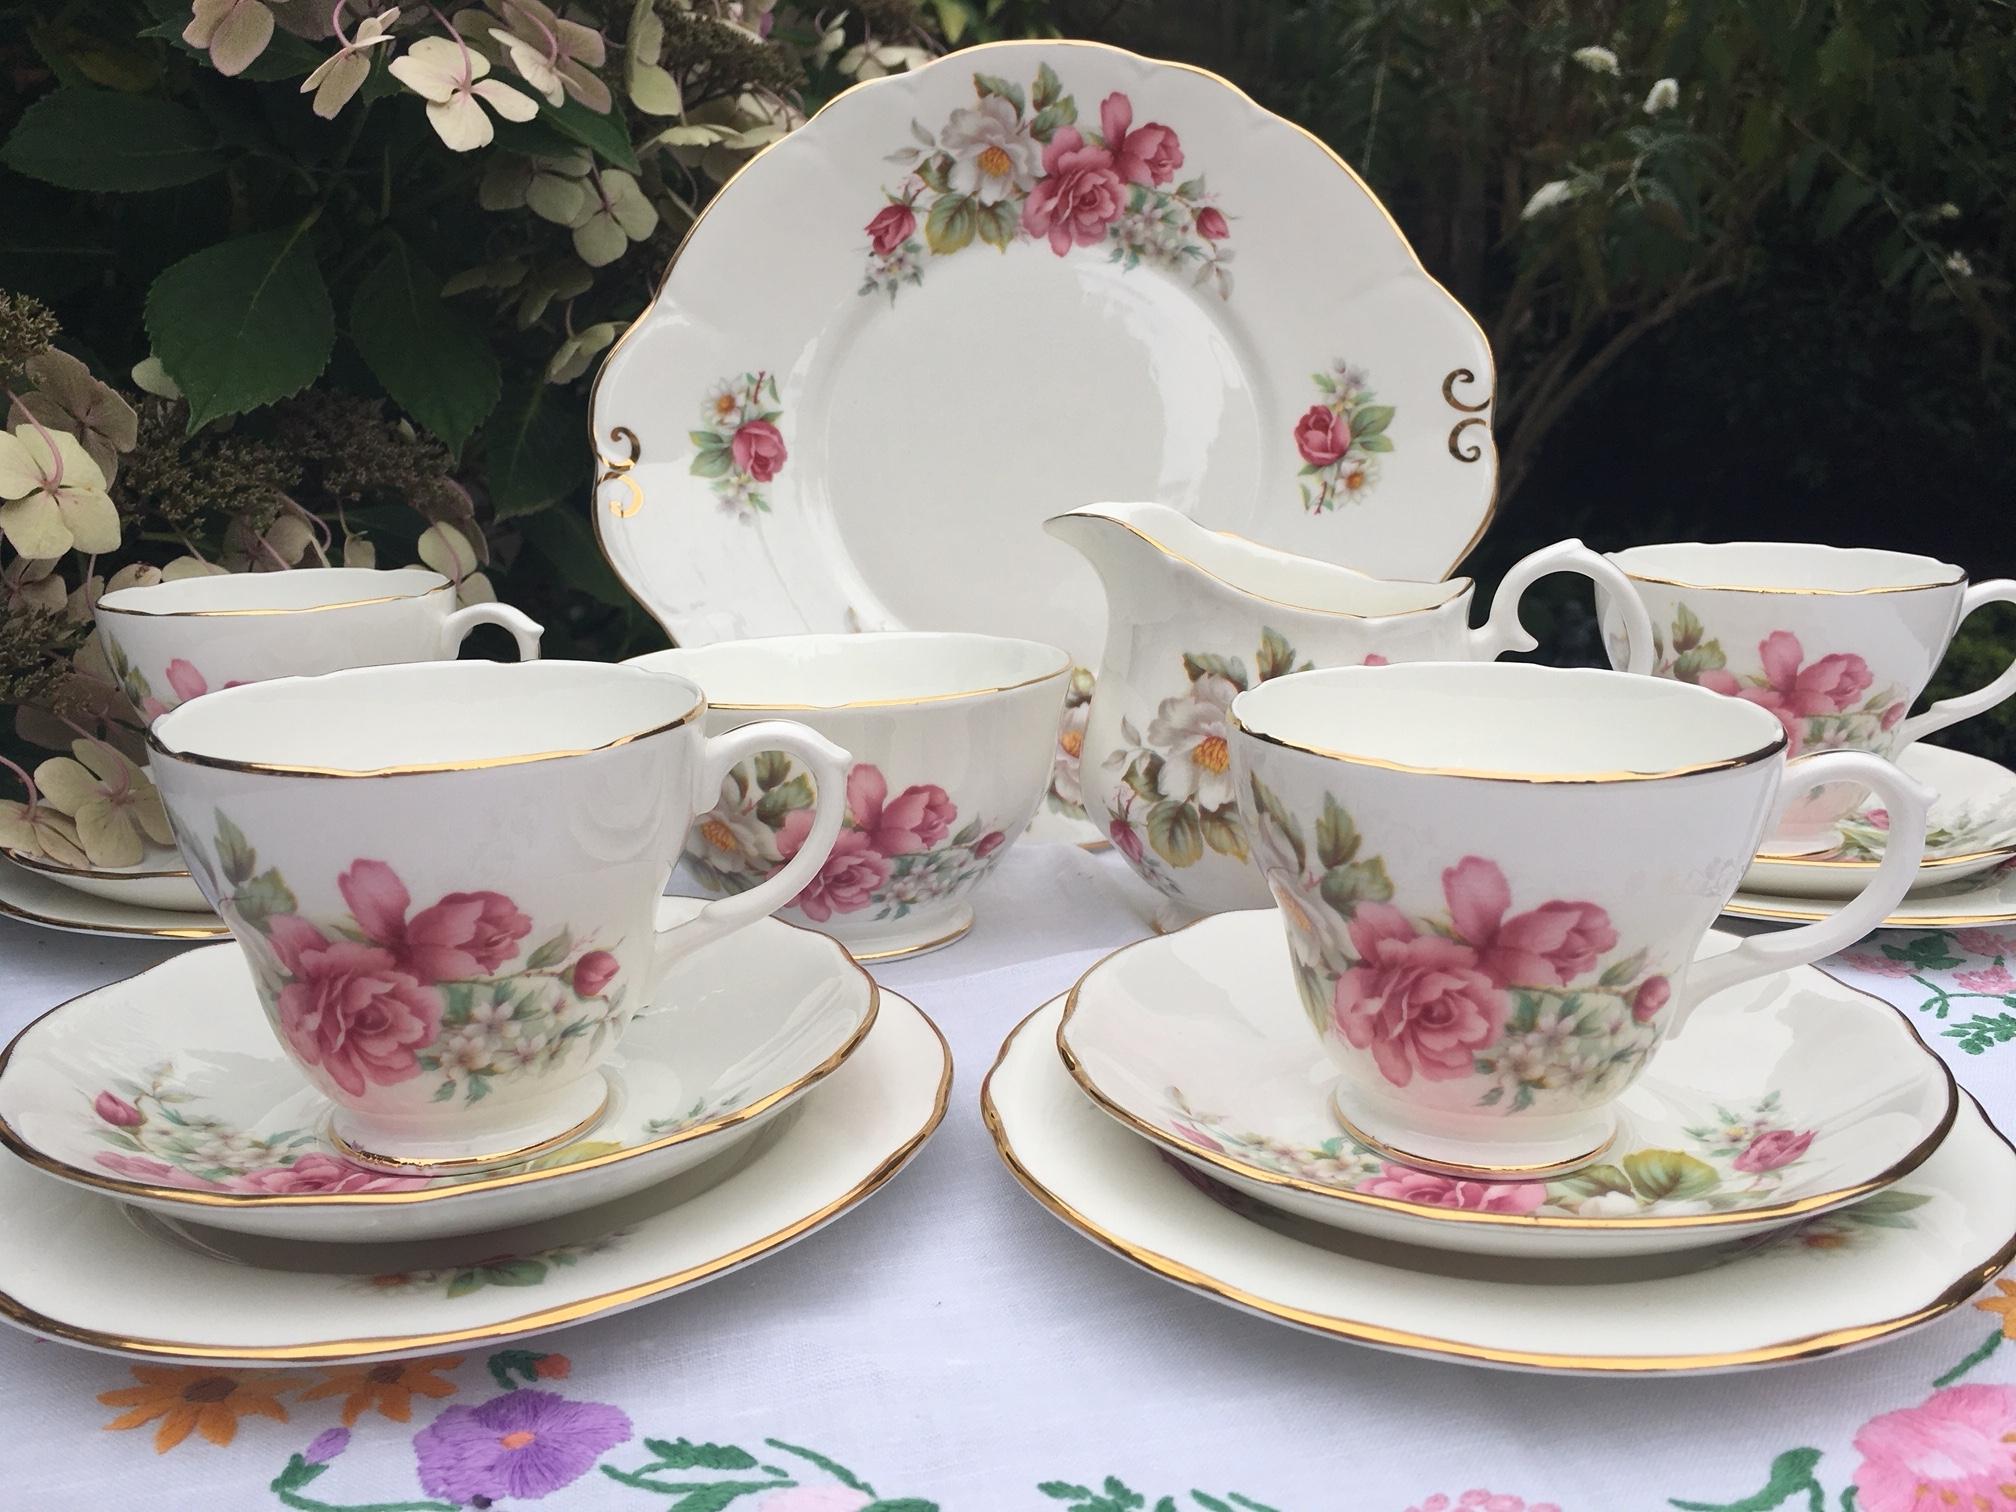 Duchess vintage teaset